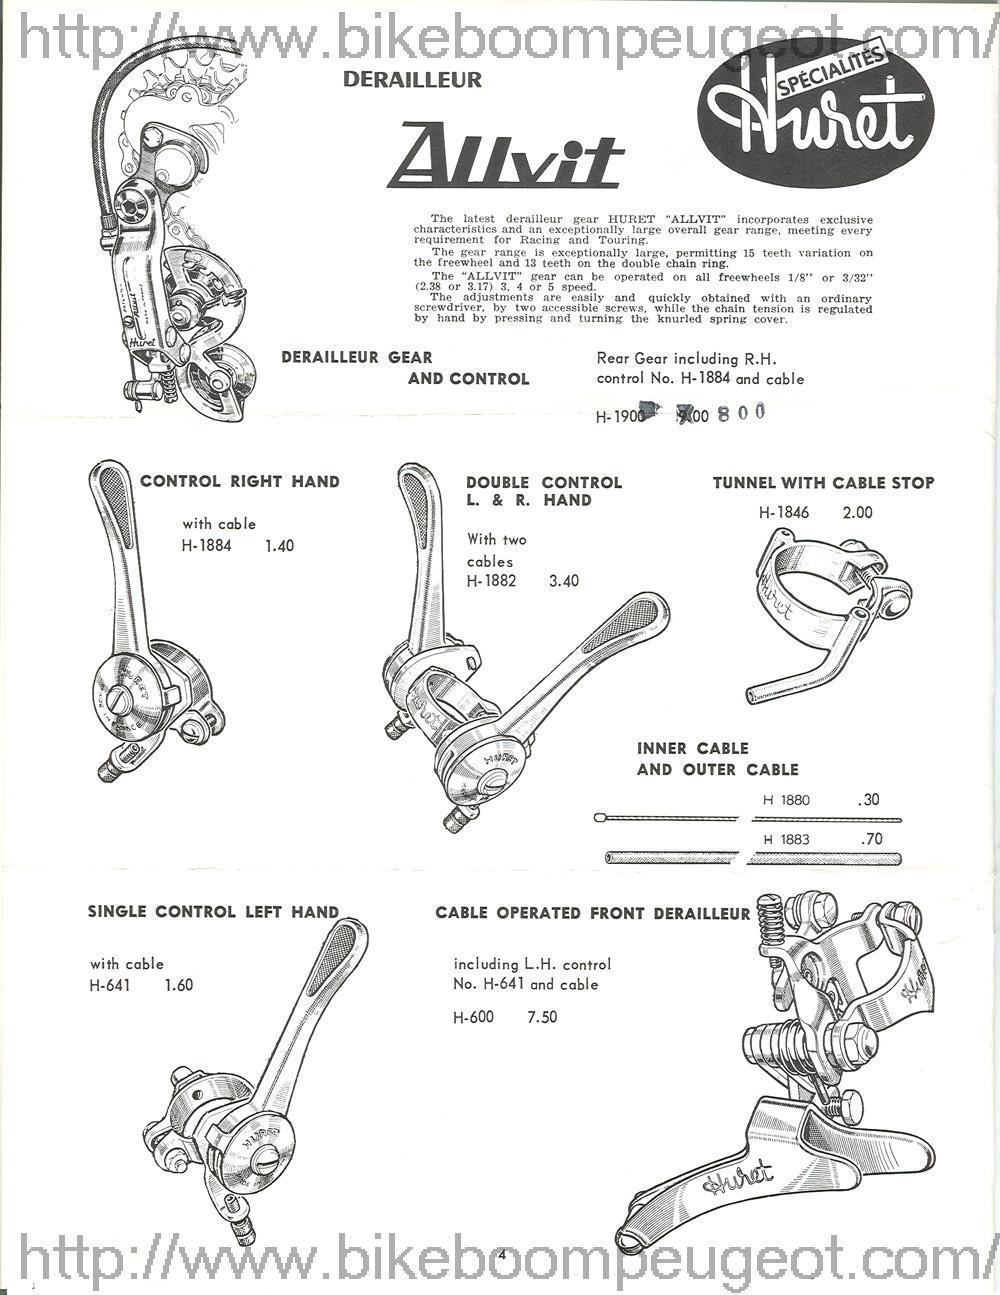 Peugeot 1963 USA Parts Acessories Brochure